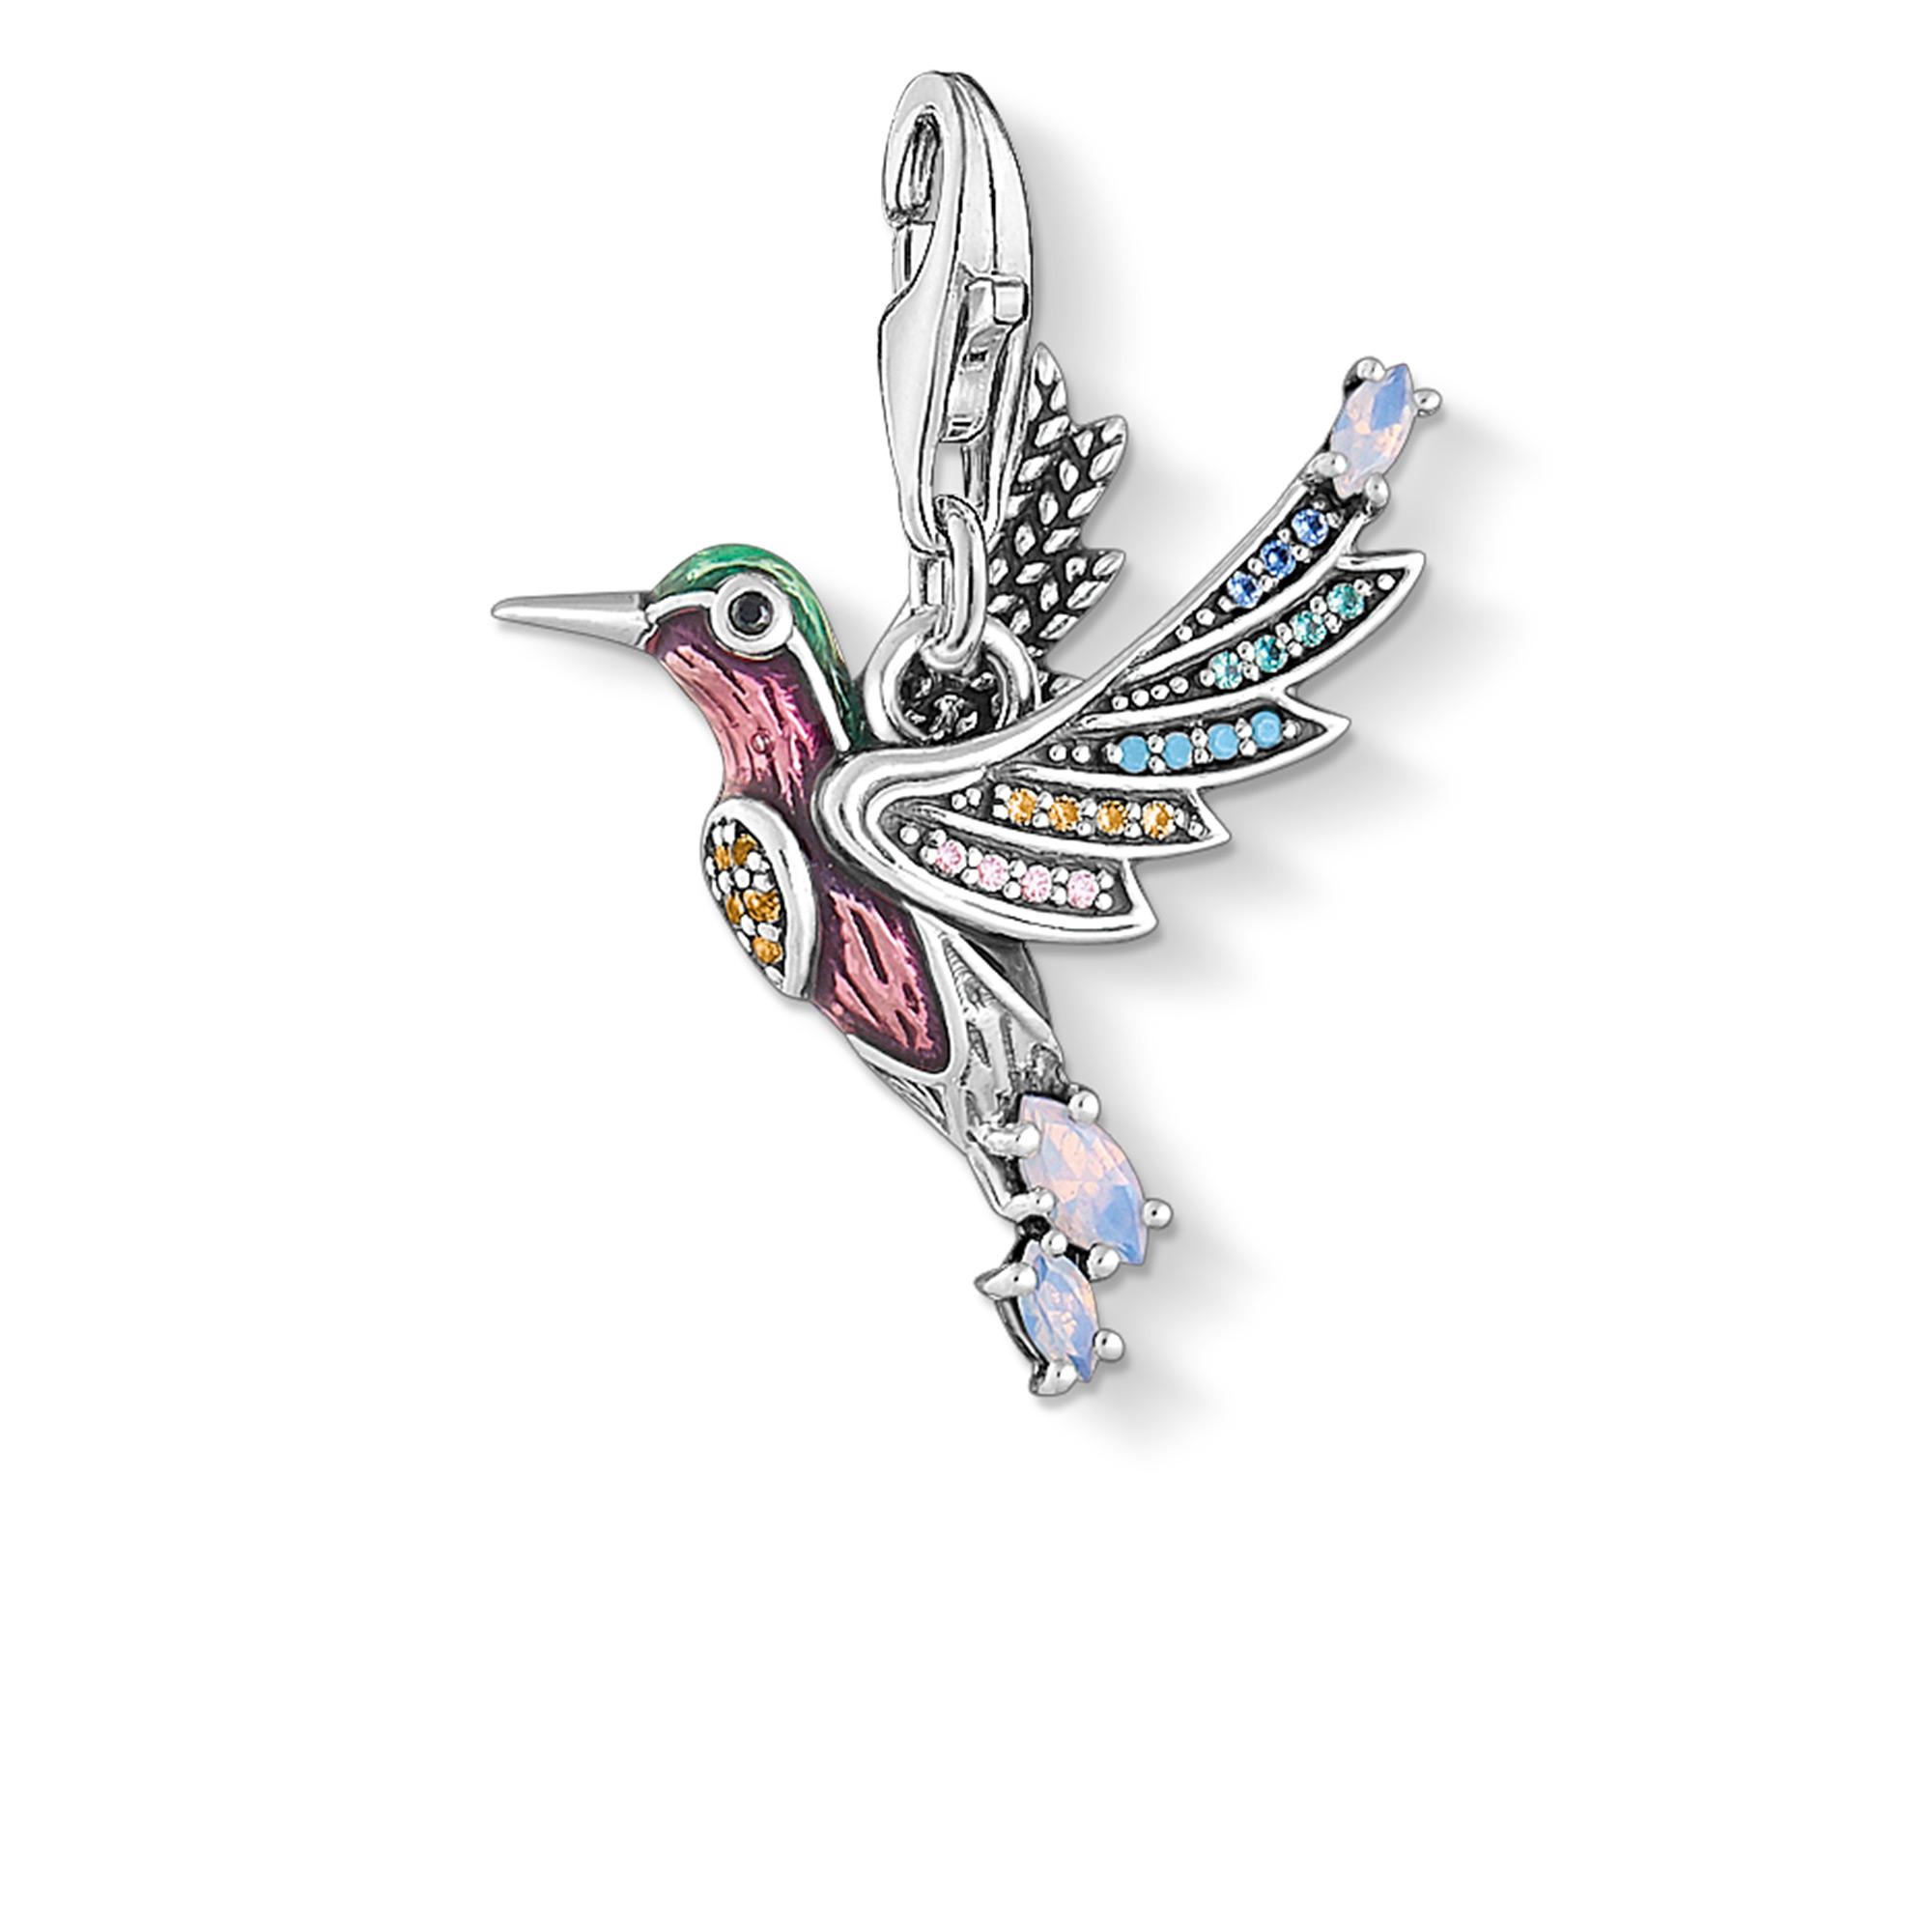 Pendentif Charm colibri argent, Thomas Sabo